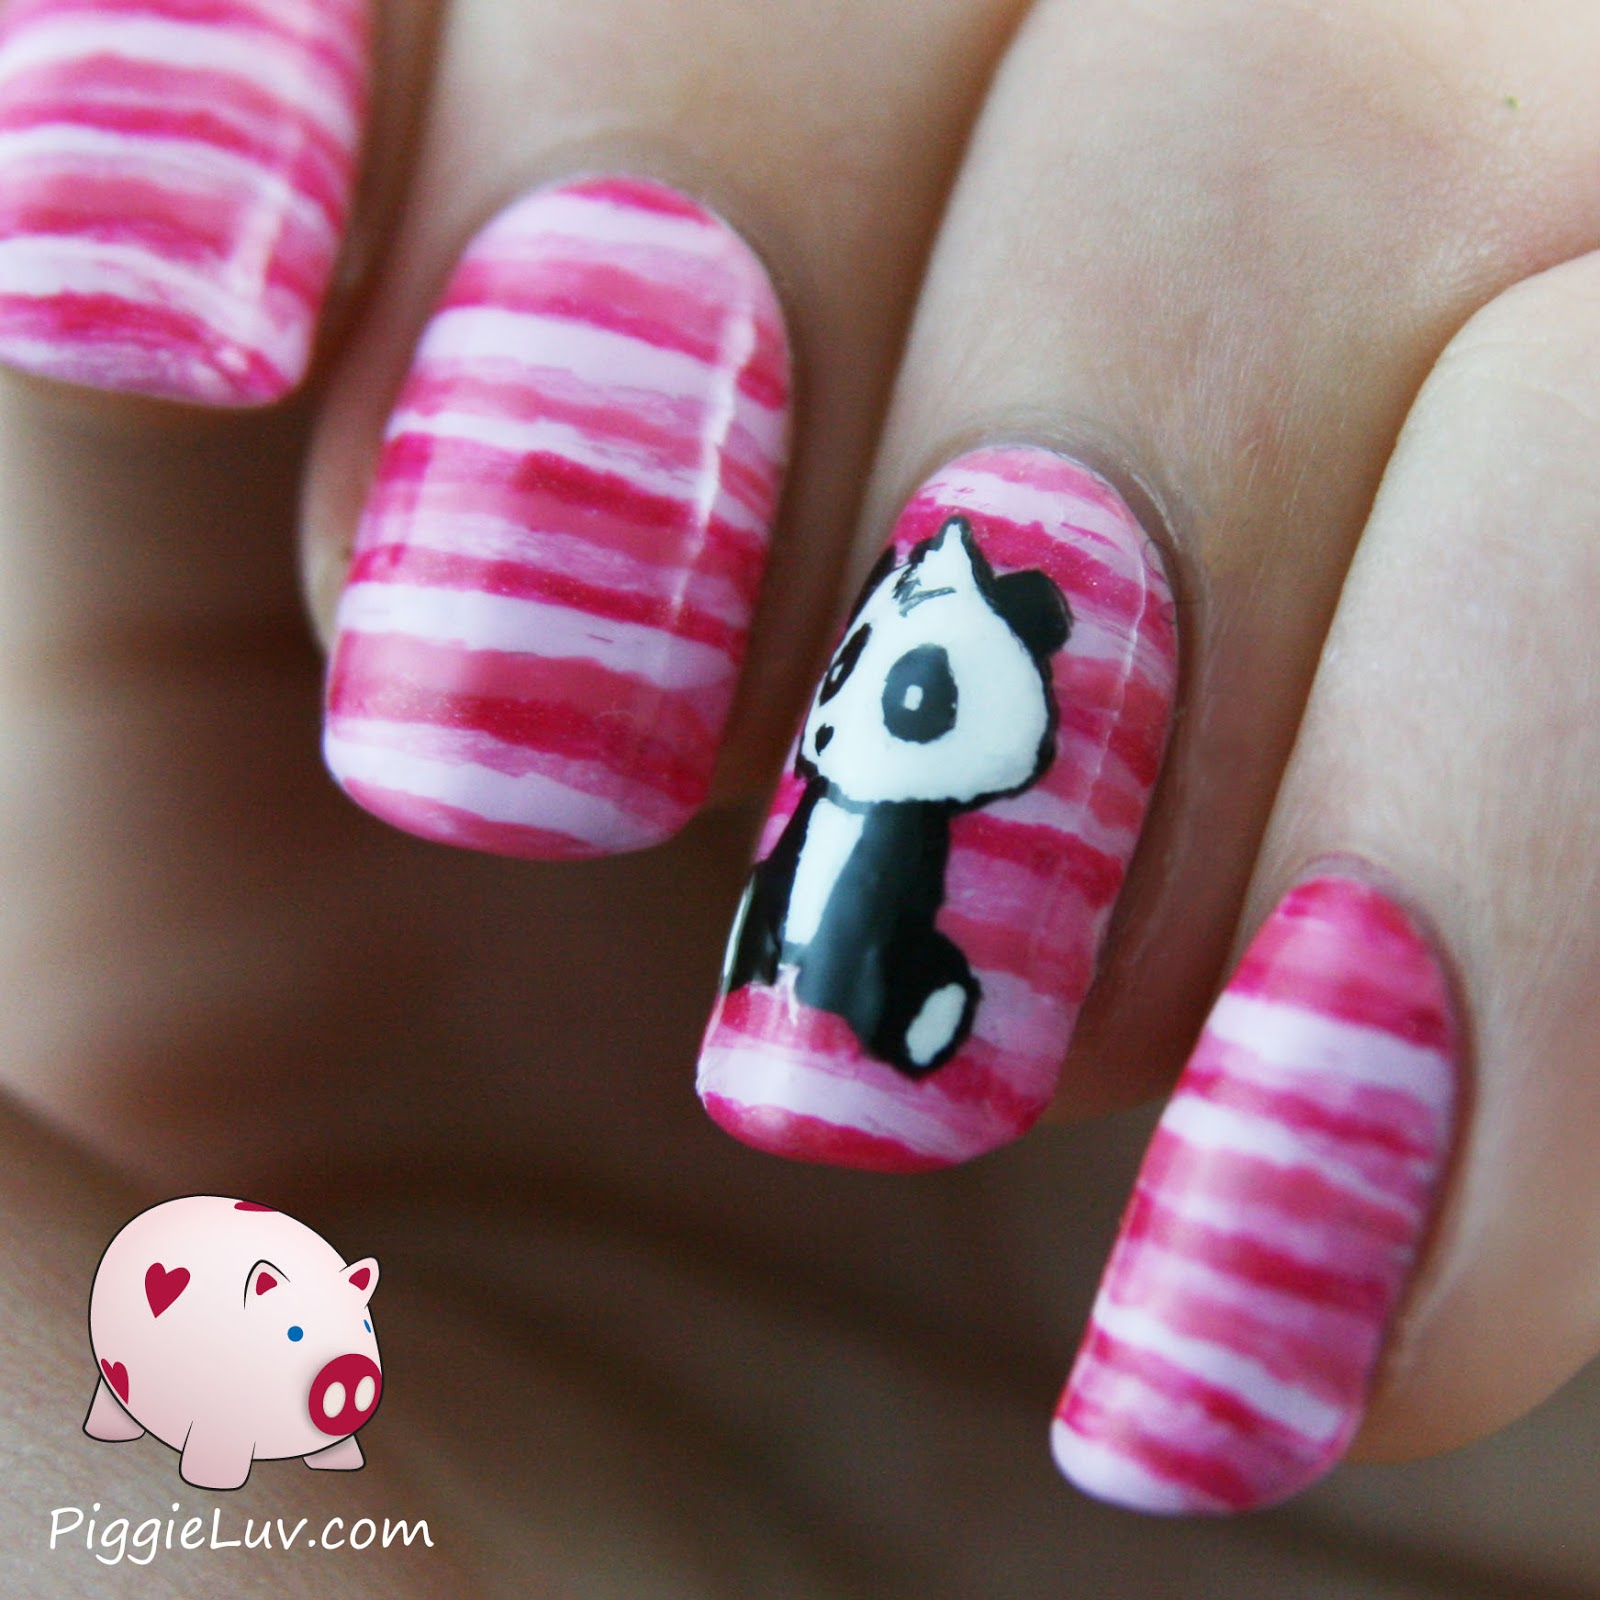 PiggieLuv: Sad panda nail art